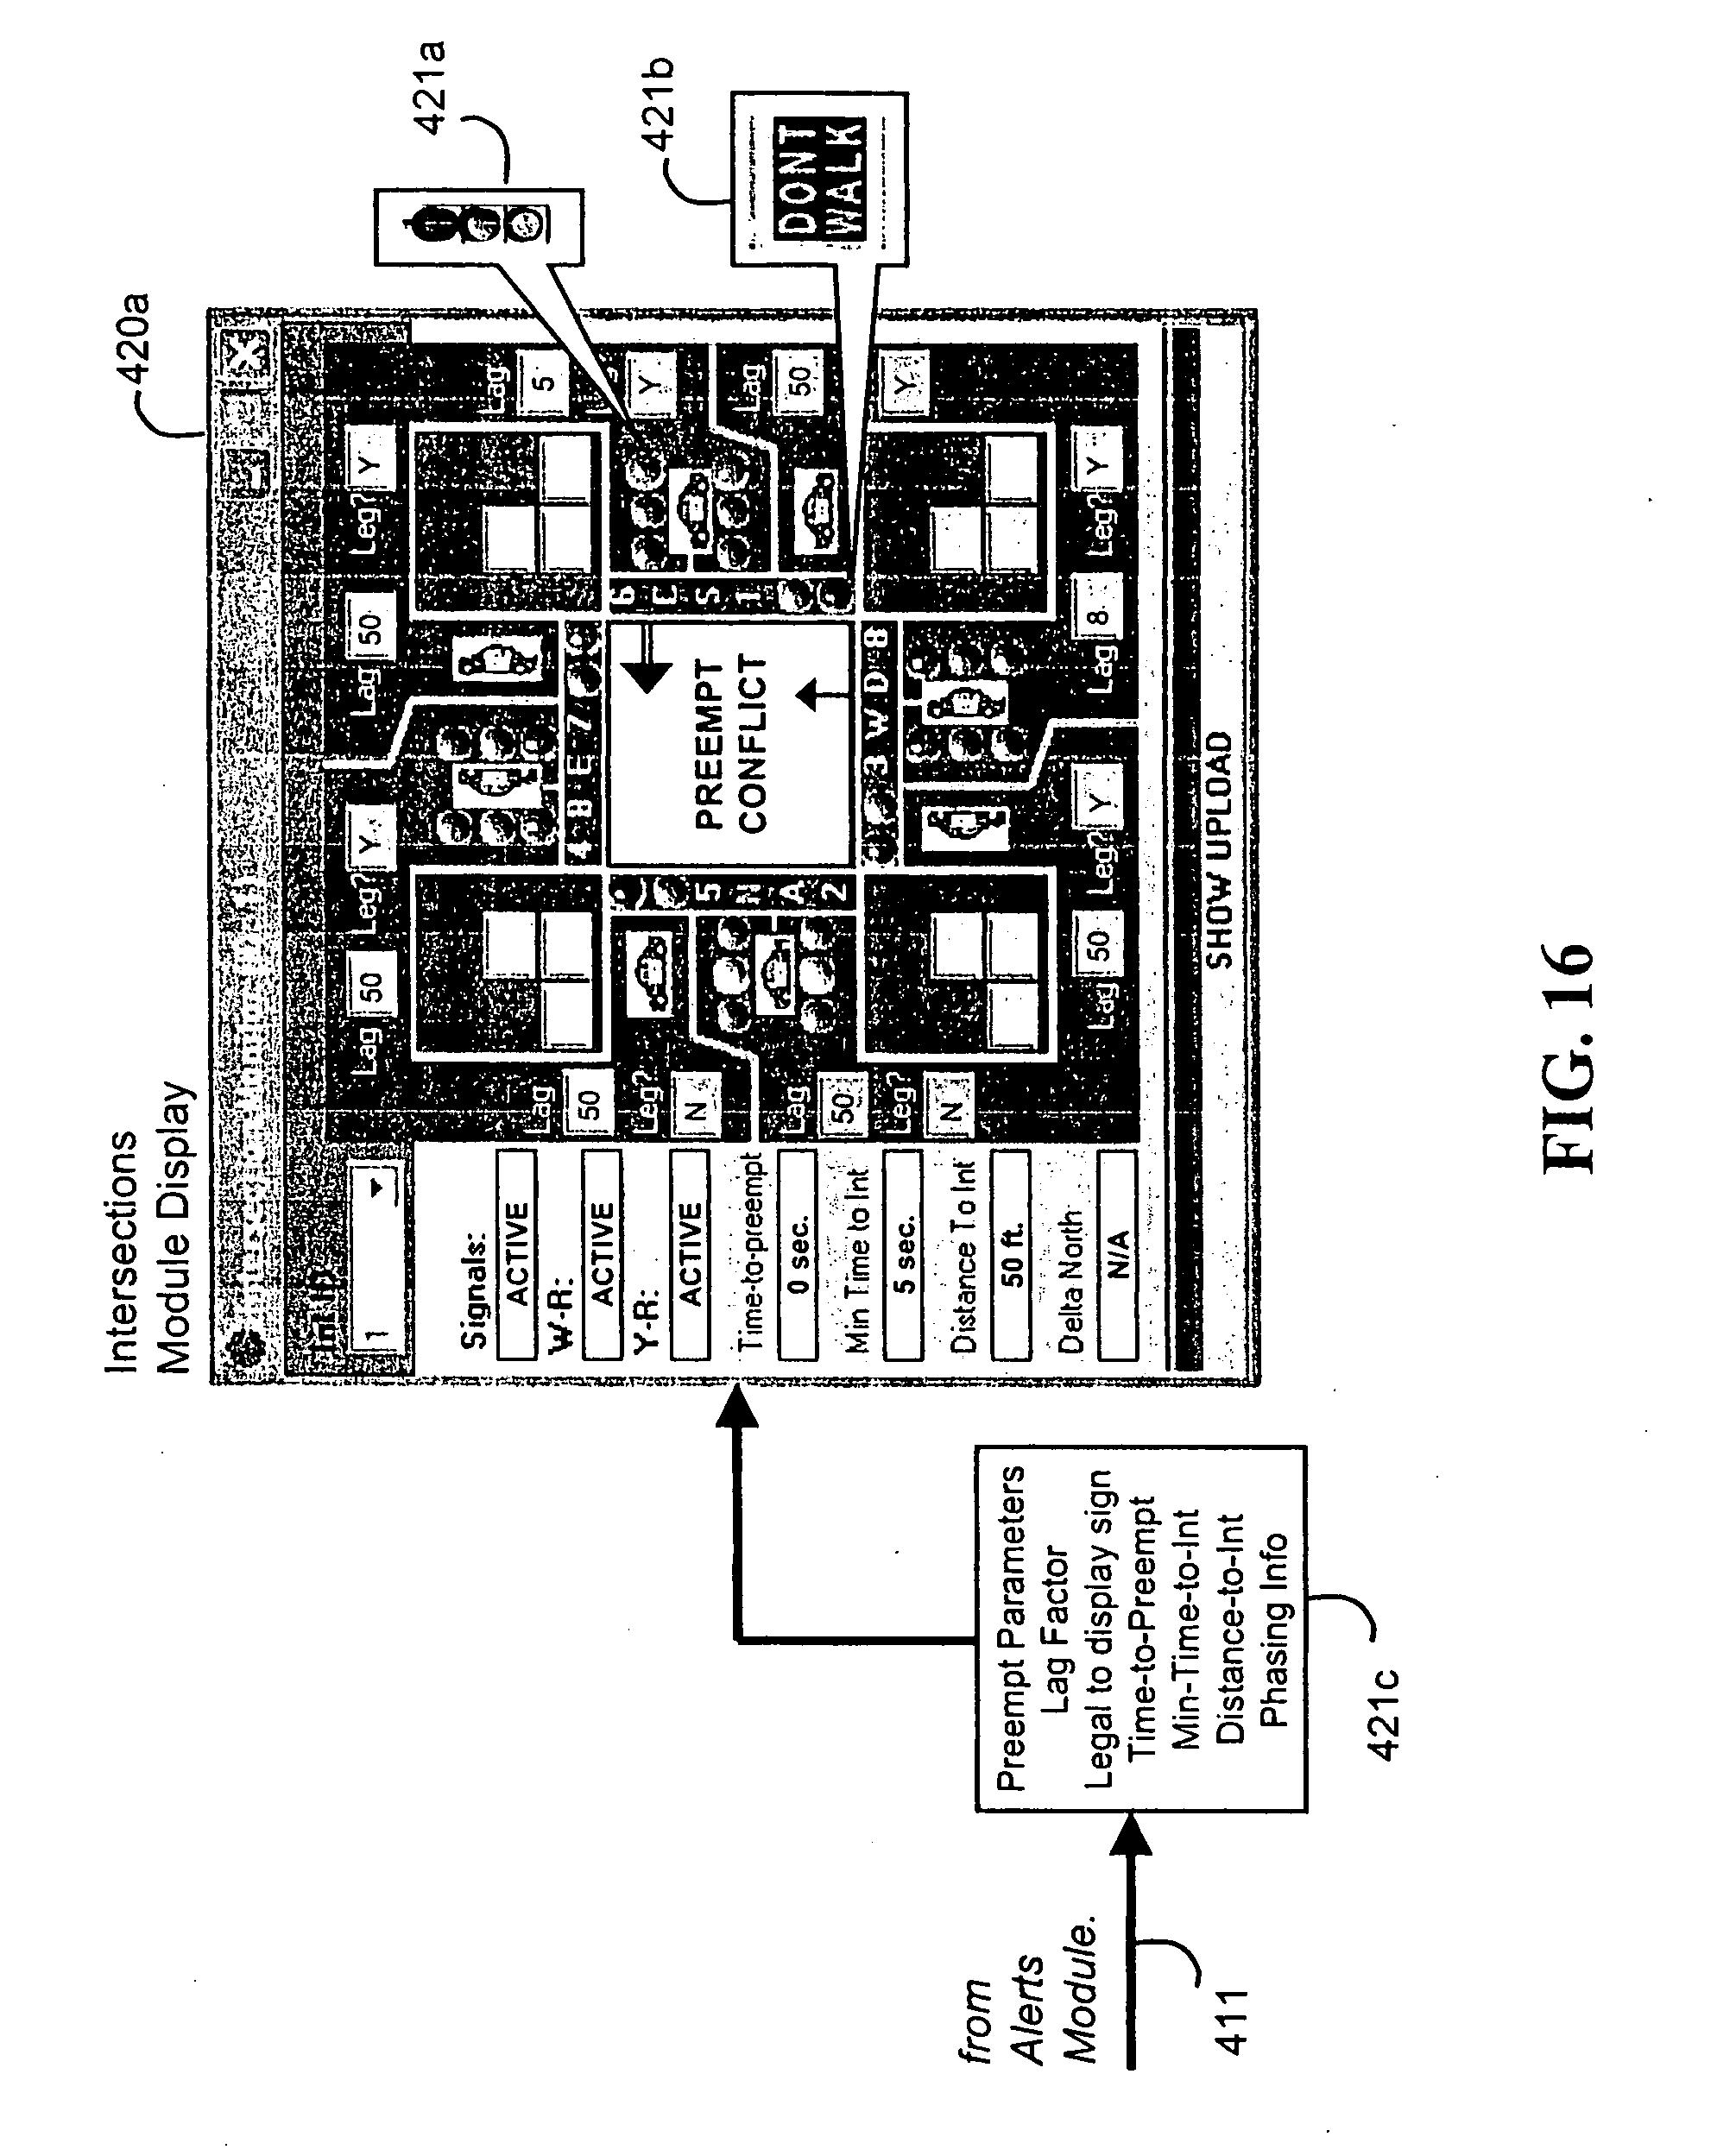 patent us20050104745 - emergency vehicle traffic signal preemption system